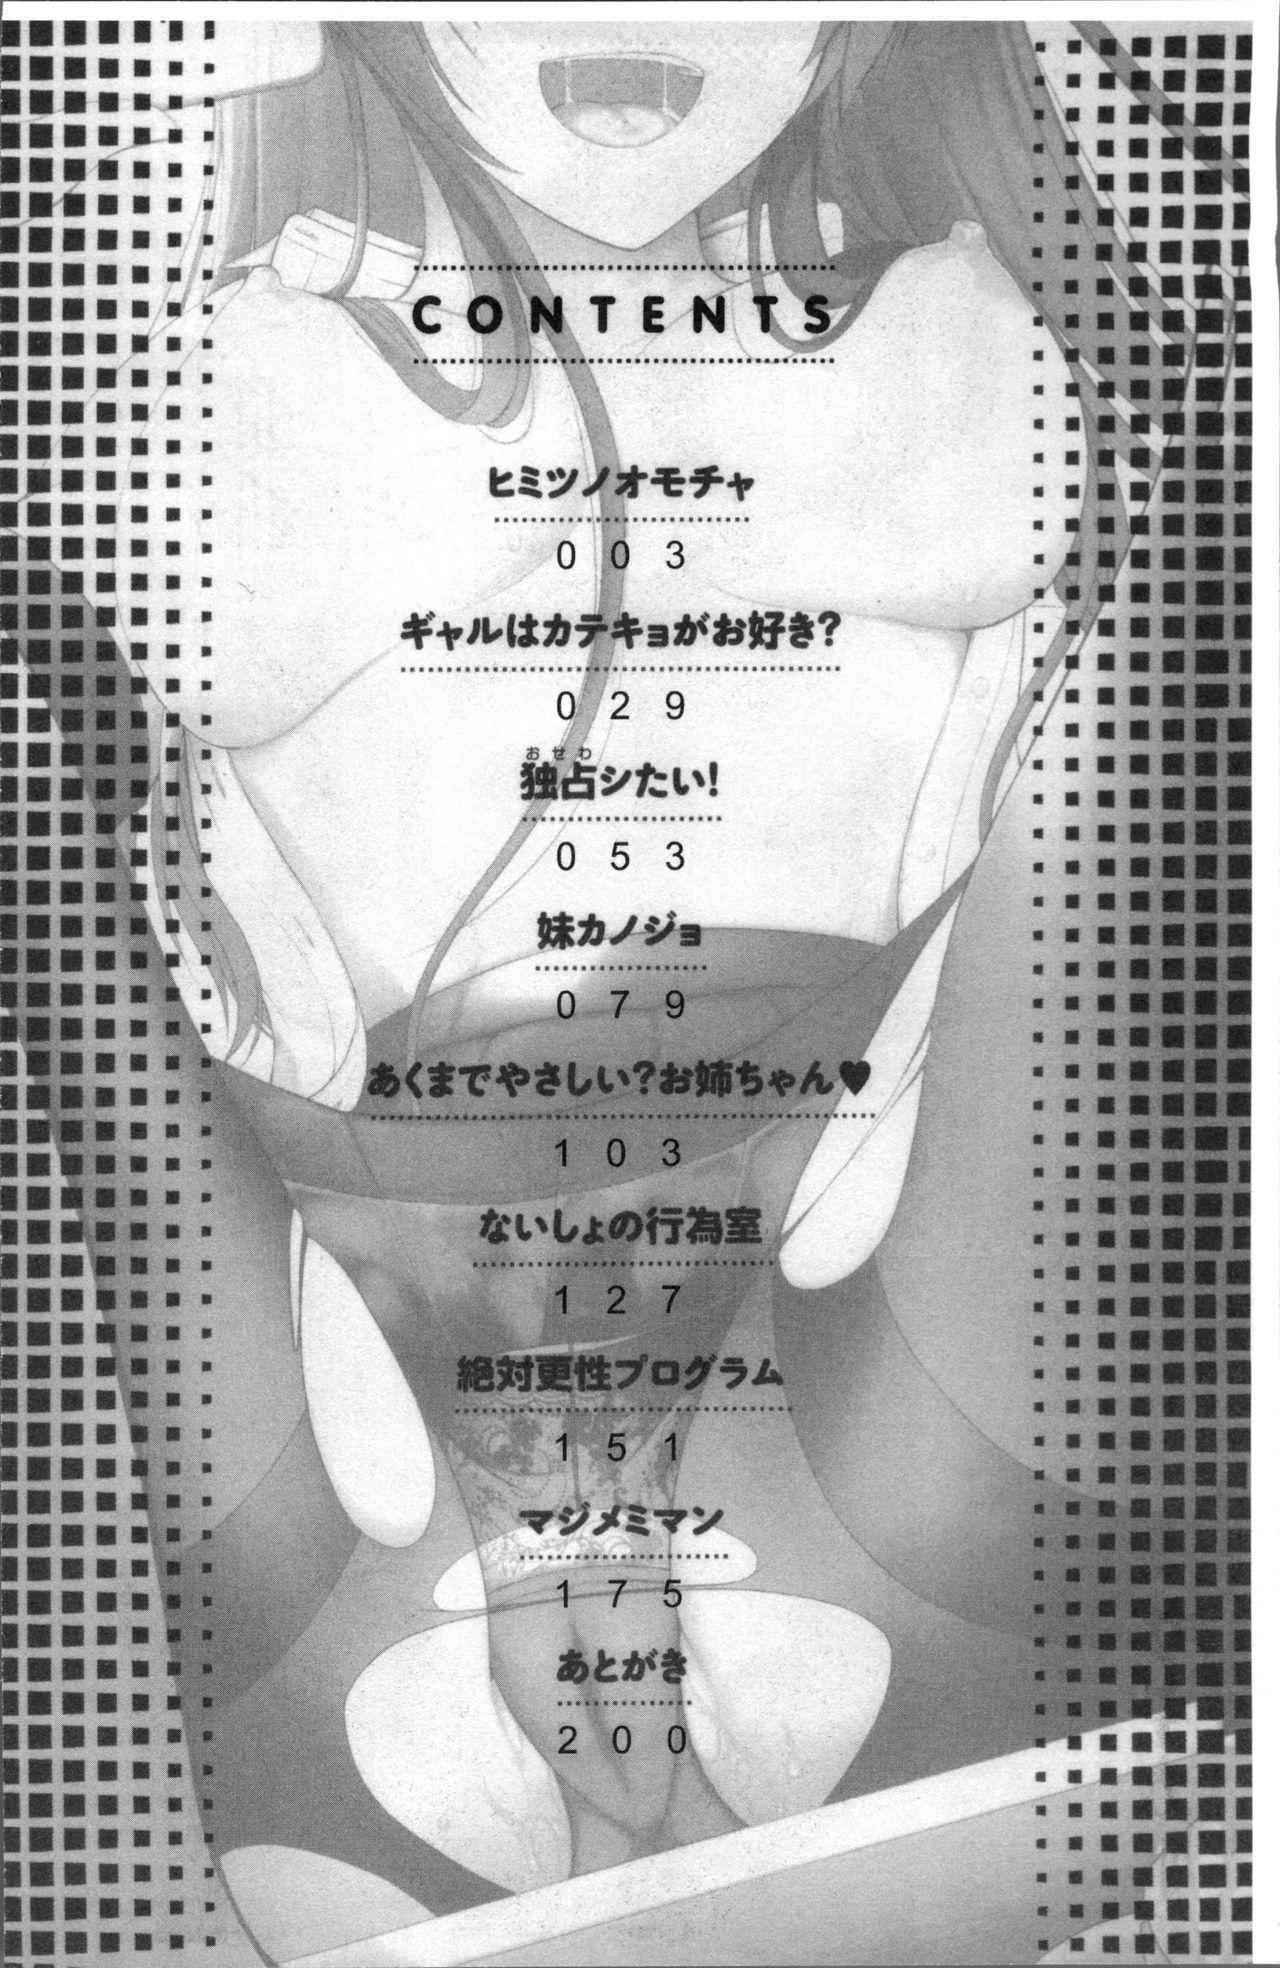 Moteasobitsukushi | 調戲挑逗的大全集 5